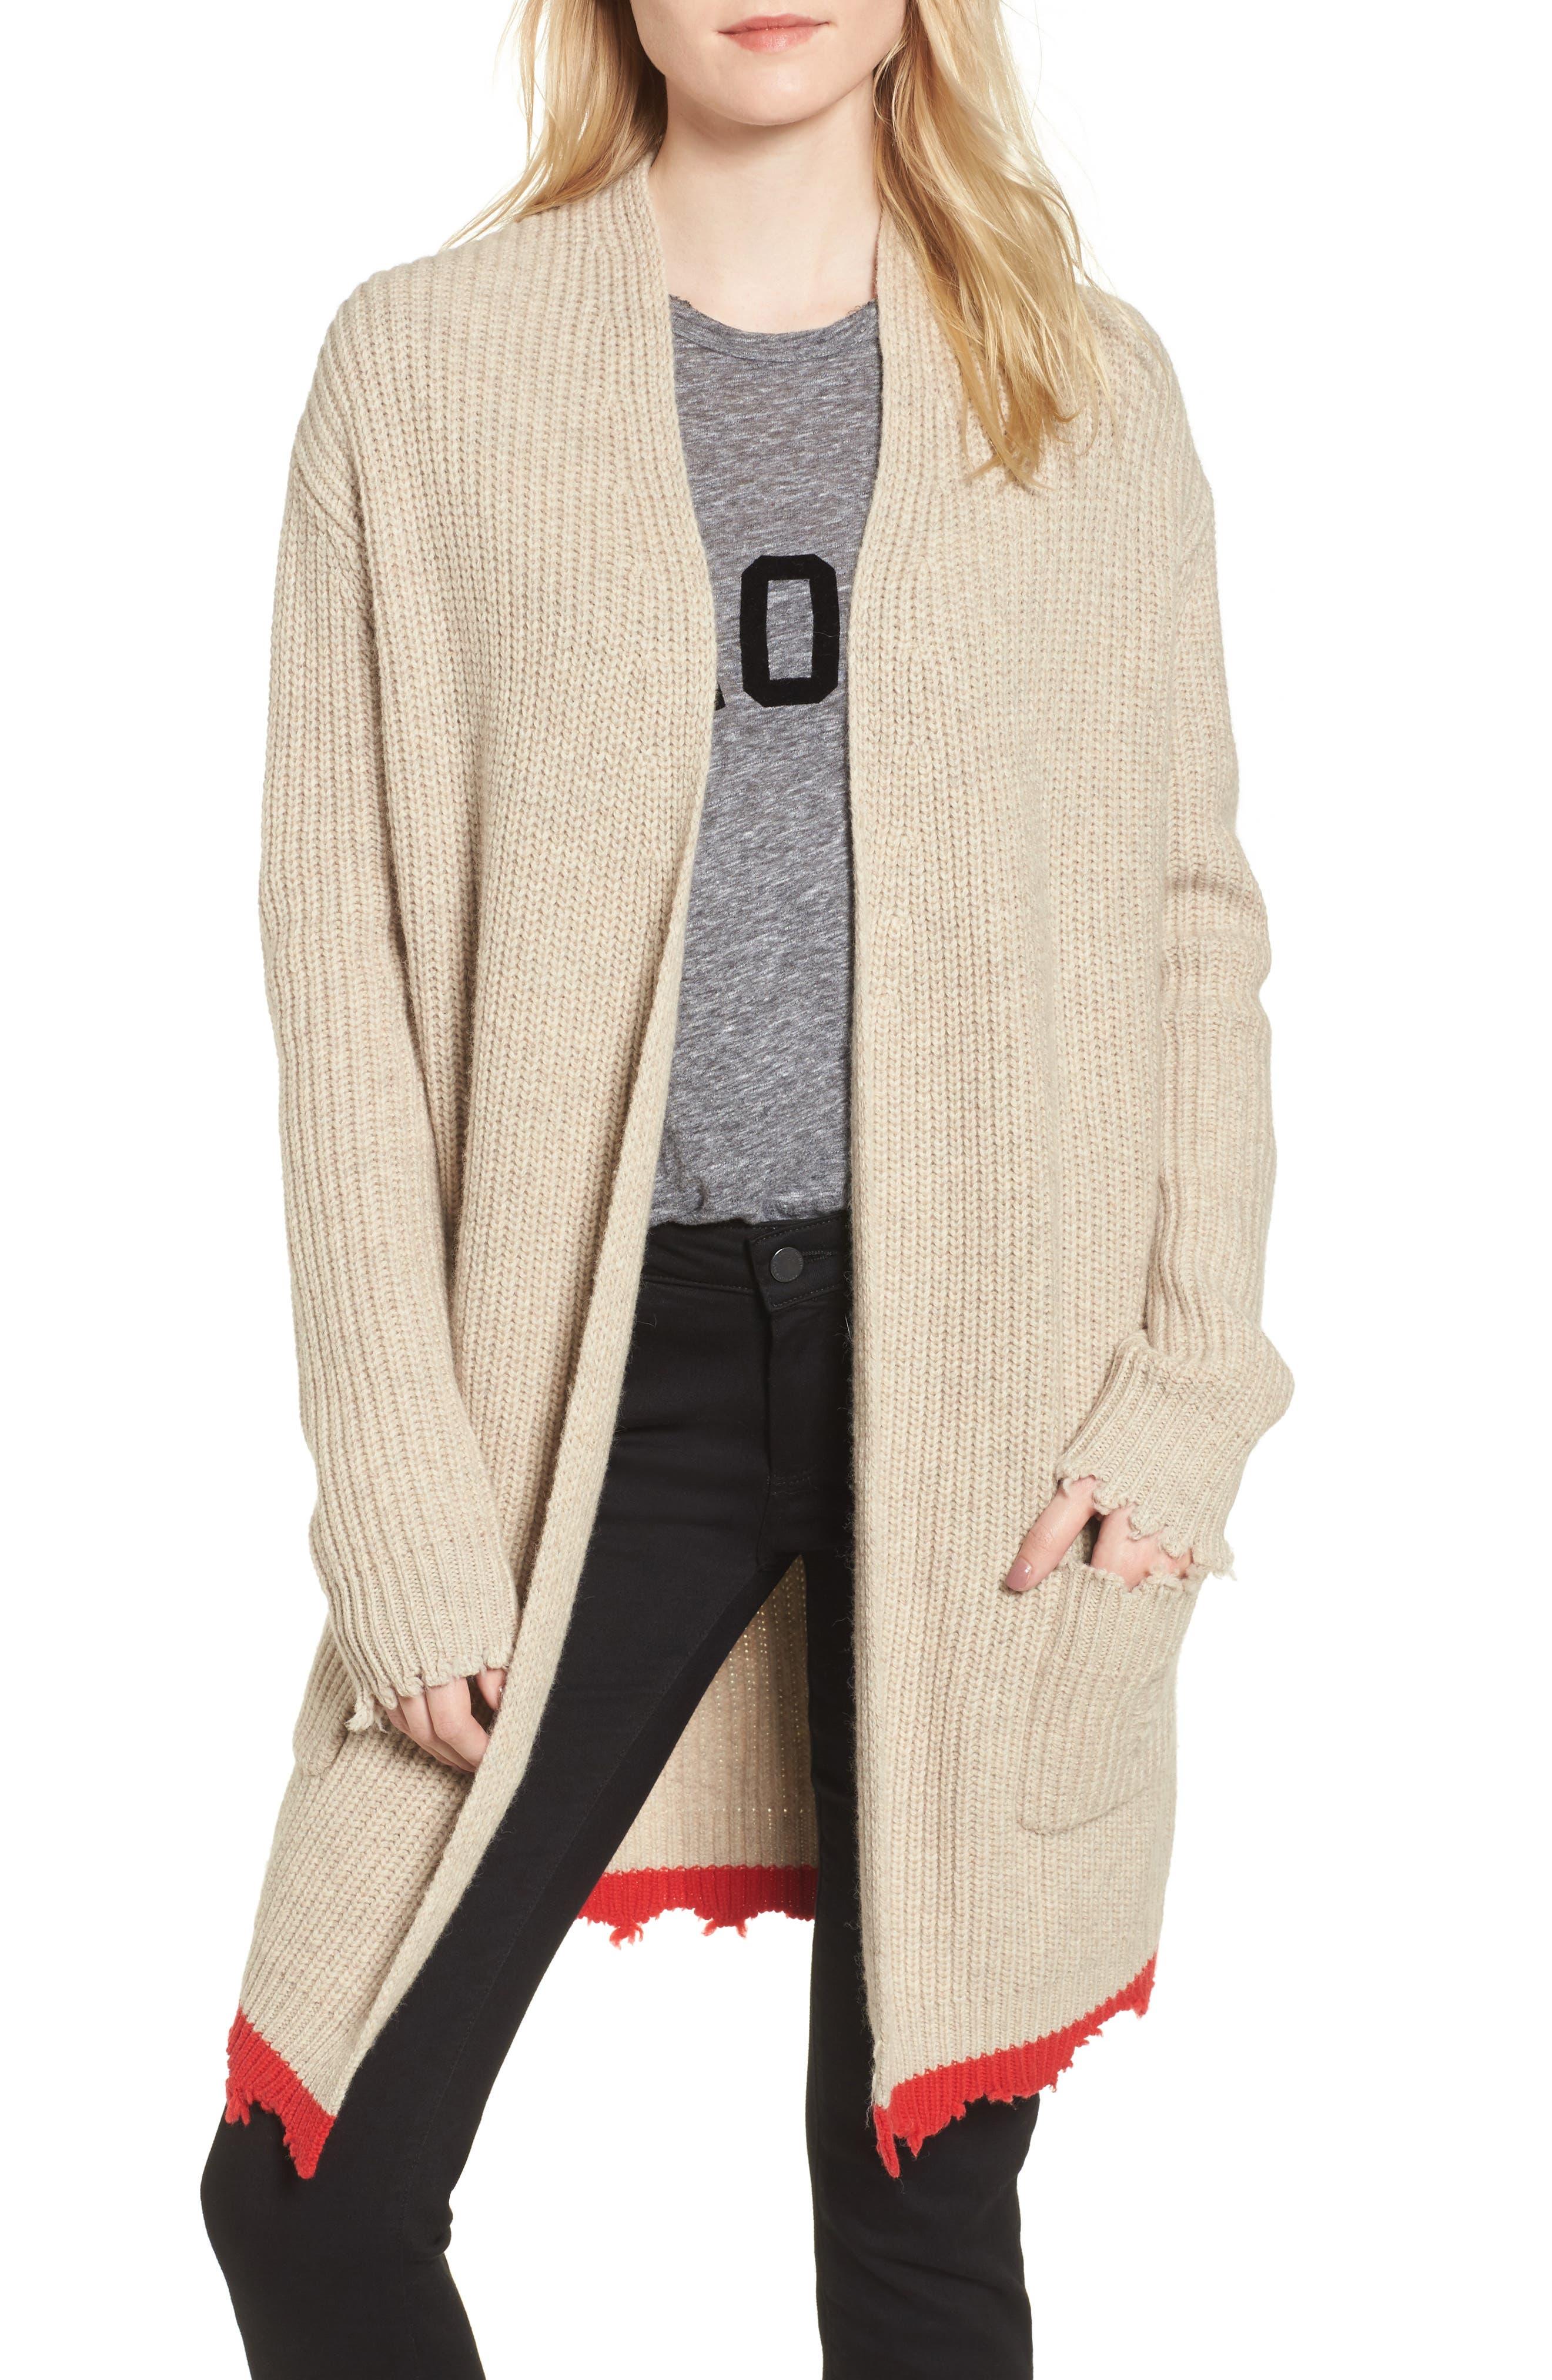 Rita Cardigan Sweater,                         Main,                         color, Beige